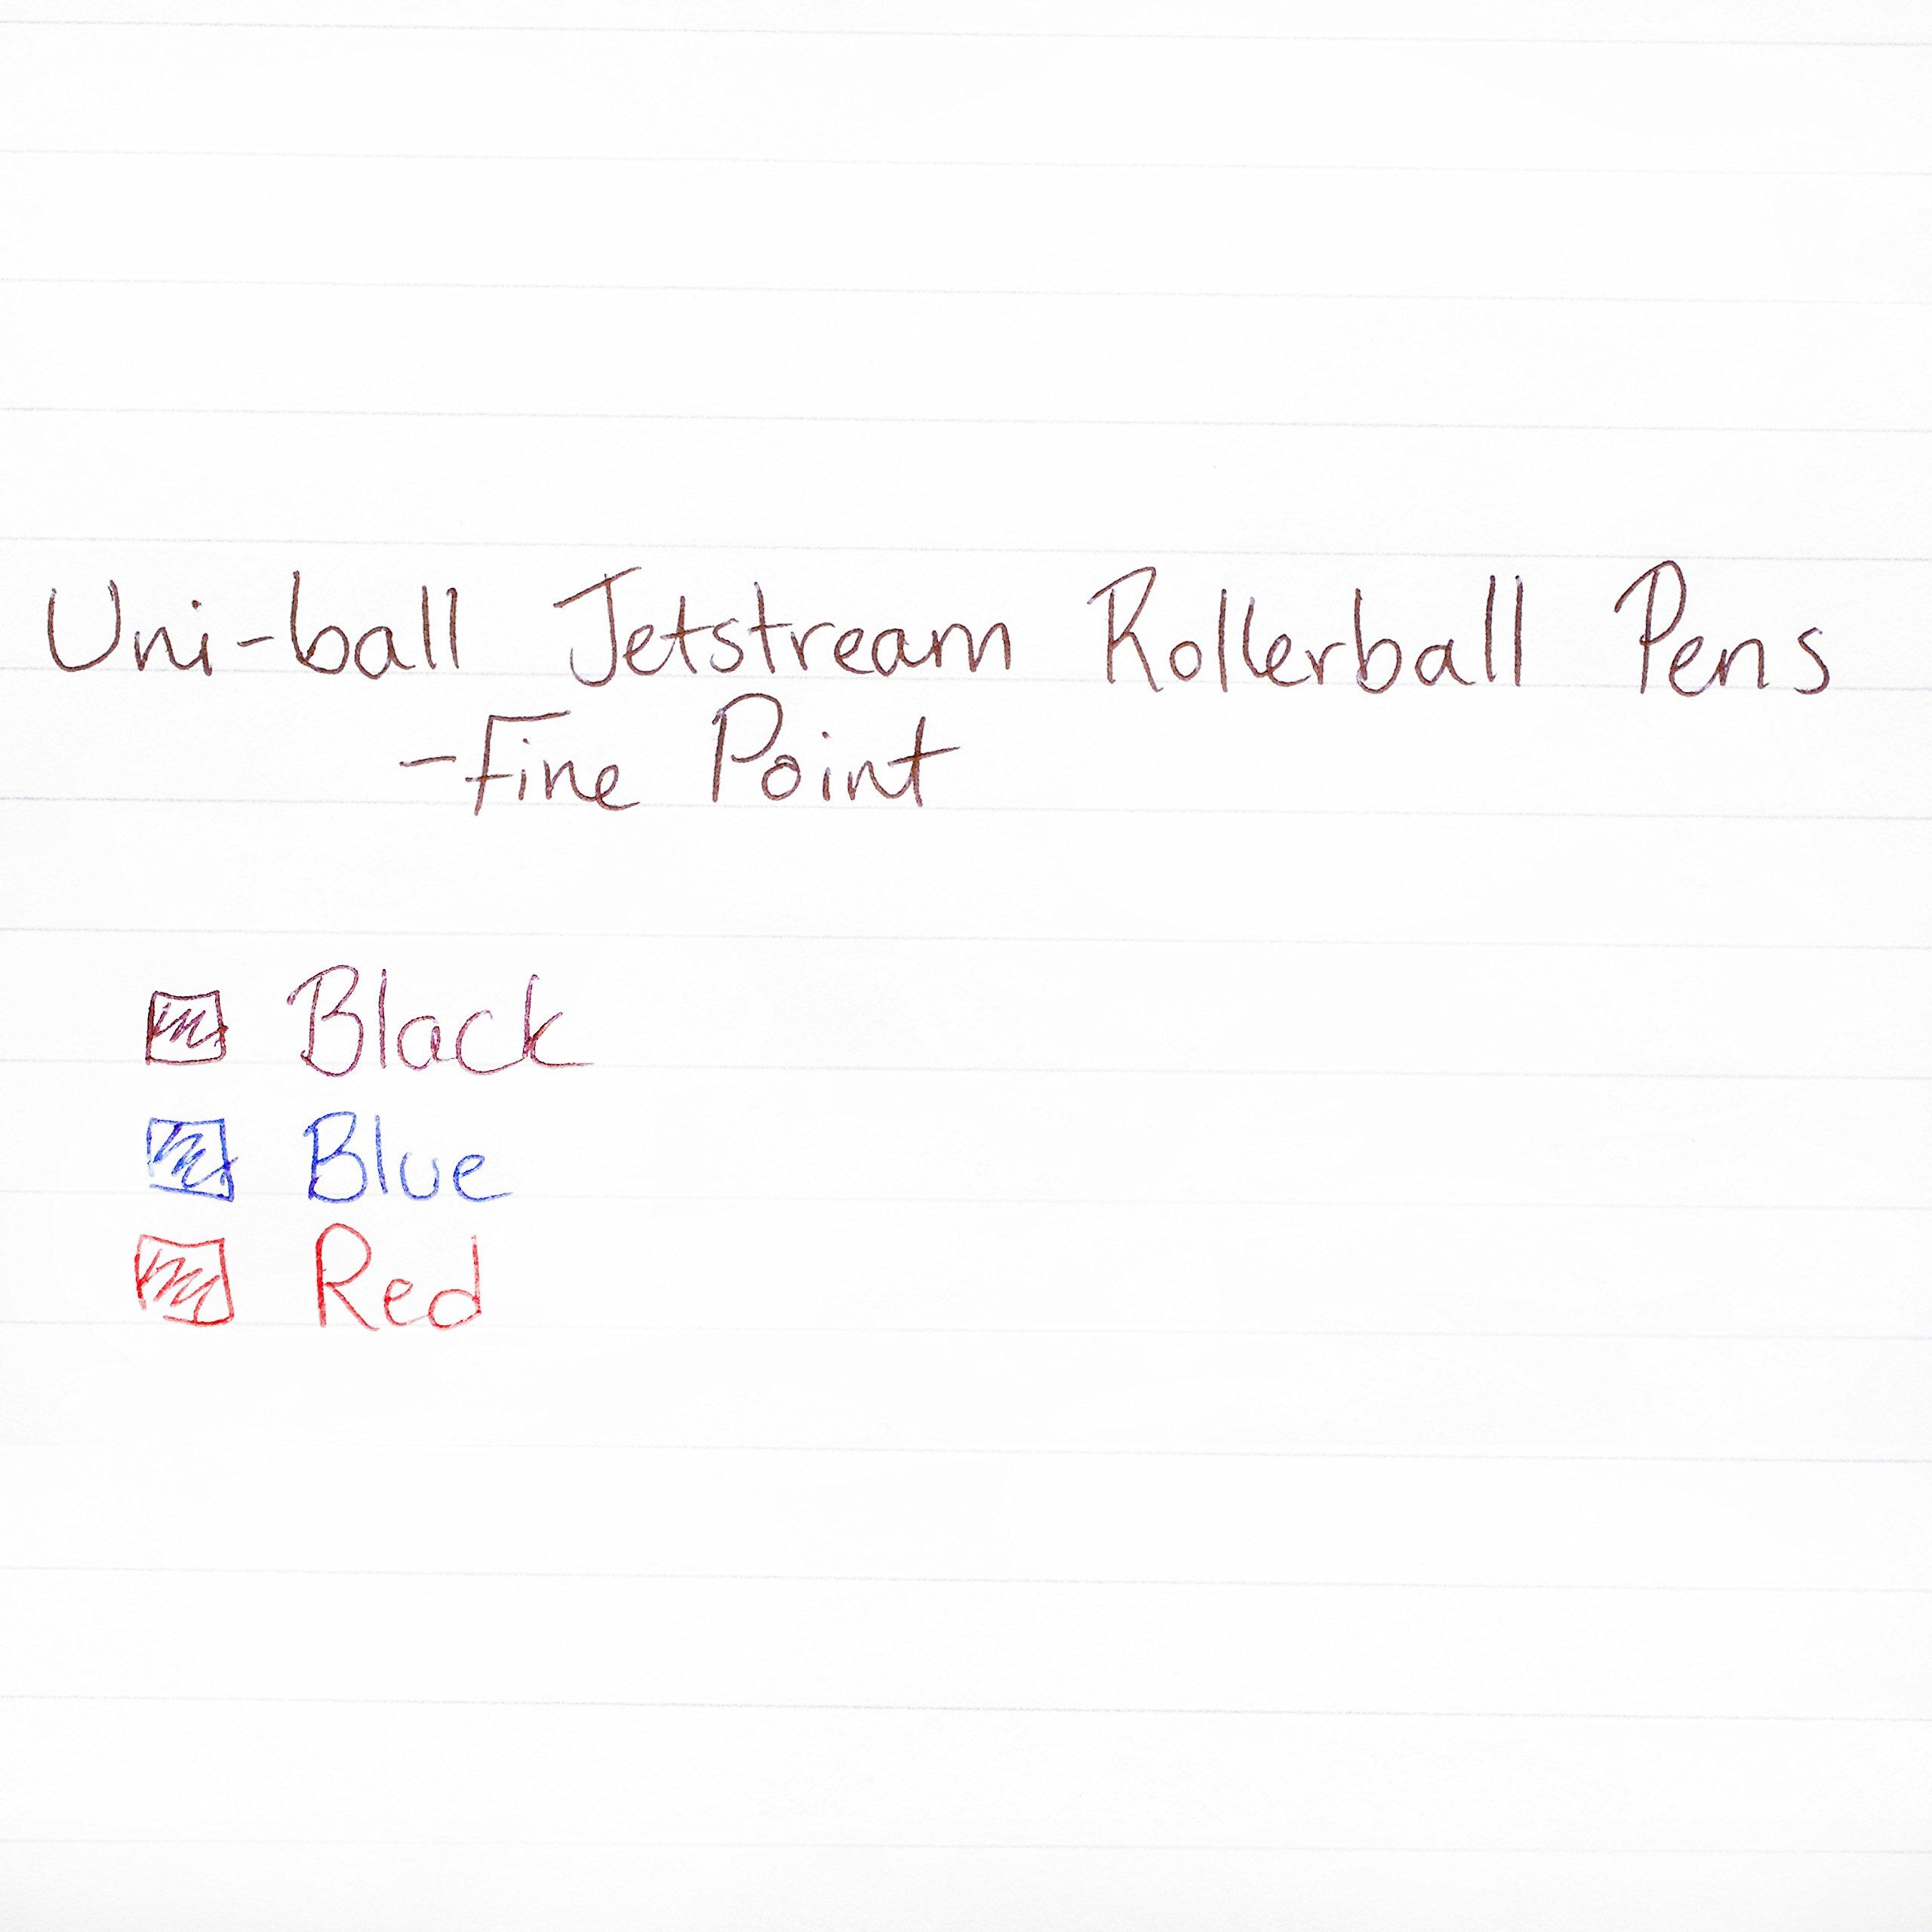 uni-ball Jetstream RT Ballpoint Pens, Fine Point (0.7mm), Black, 12 Count by Sharpie (Image #6)